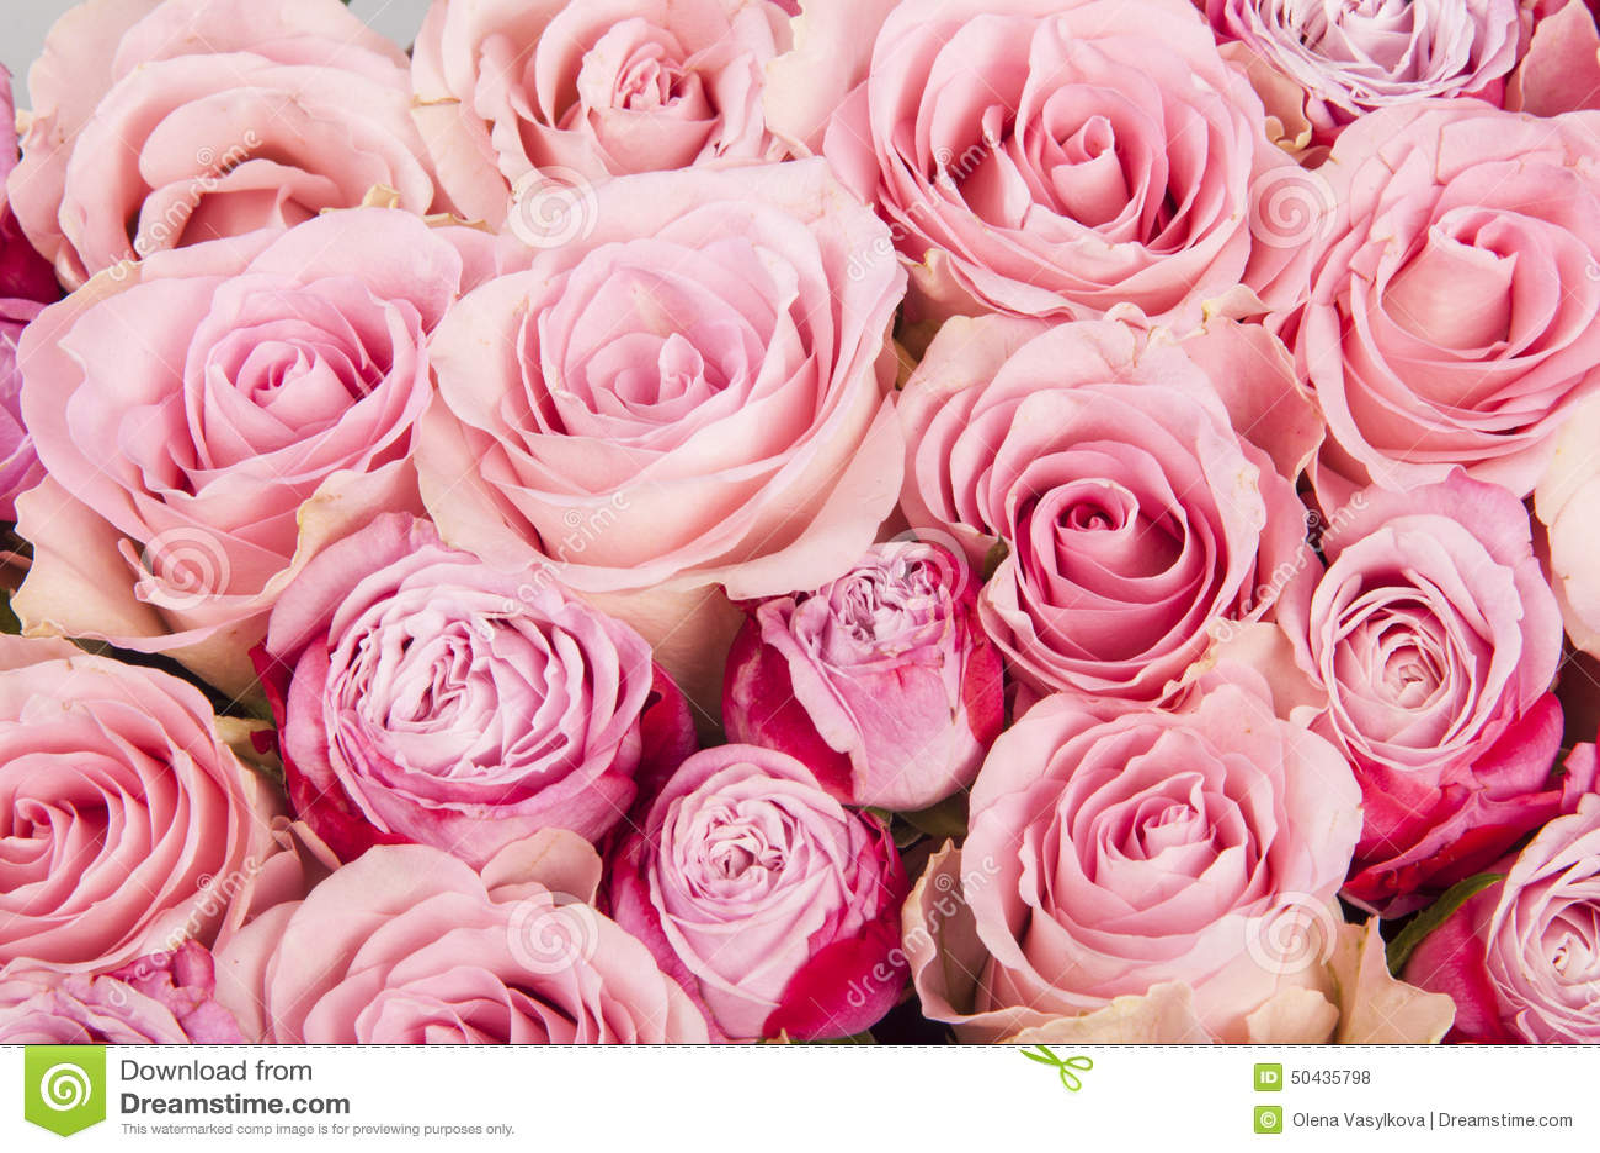 Cute Roses Wallpapers Download Fond Avec De Belles Roses Roses Photo Stock Image Du